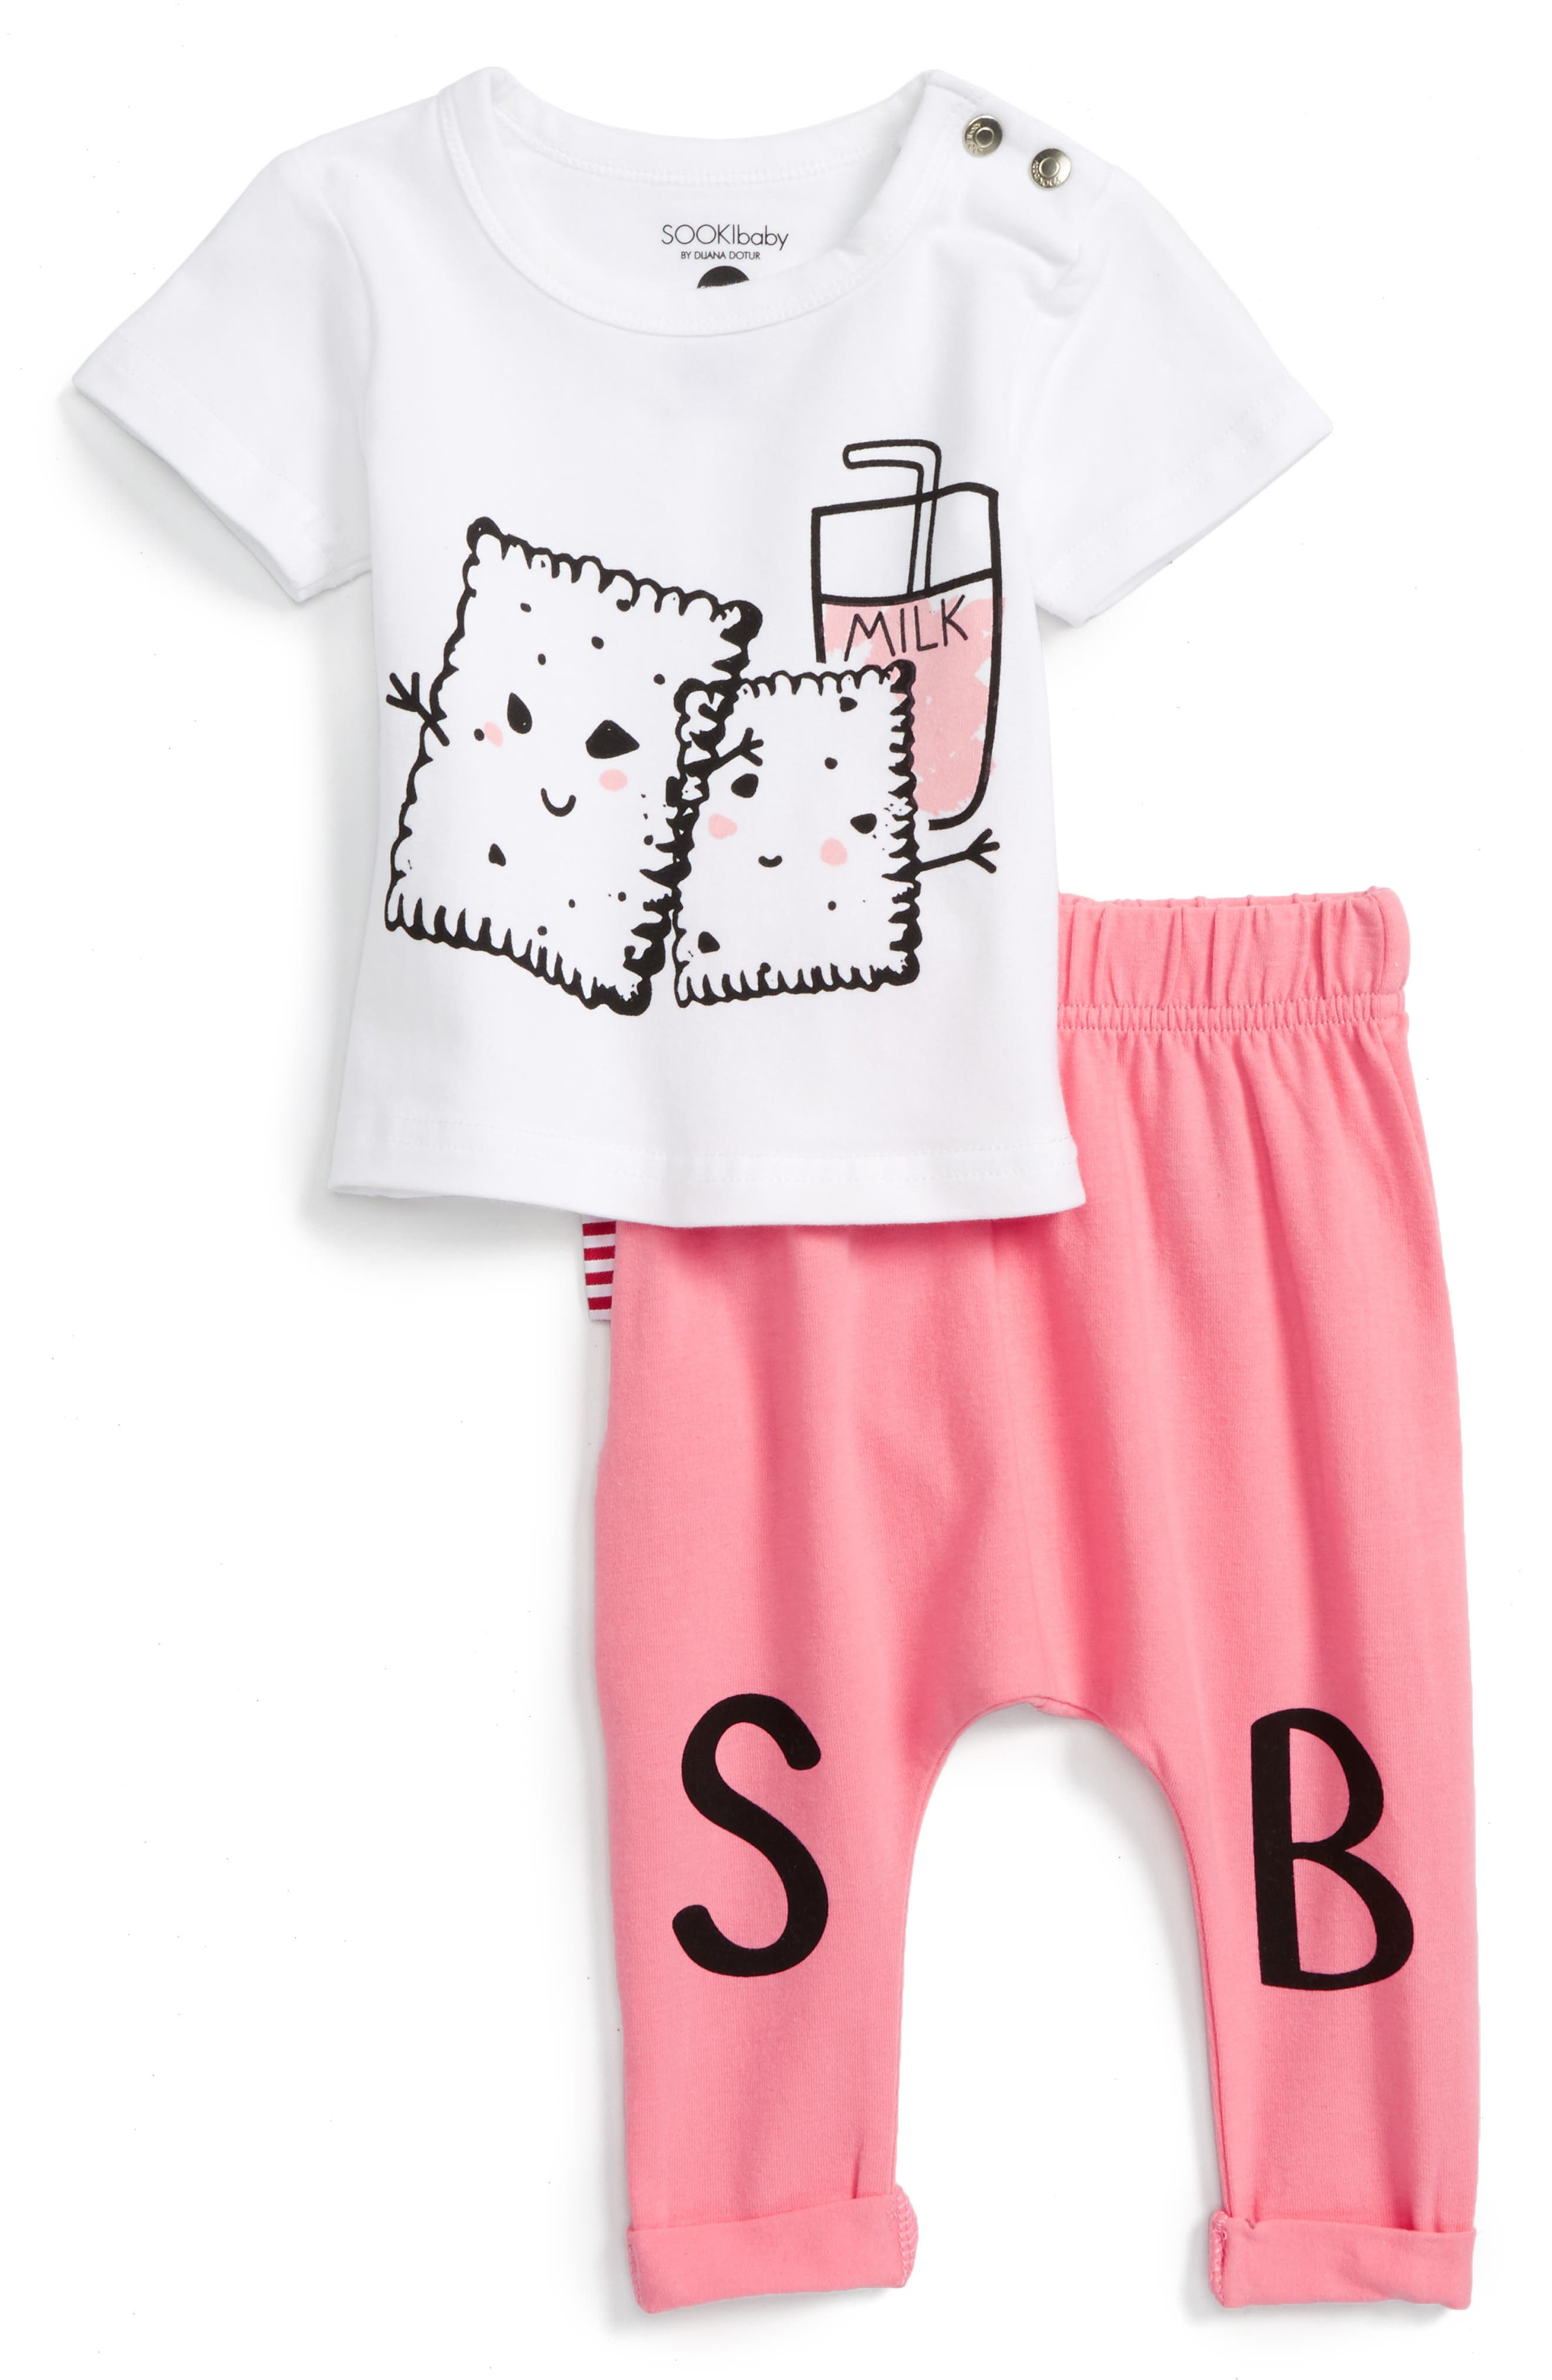 SOOKIbaby Print Tee & Leggings Set (Baby Girls & Toddler Girls)